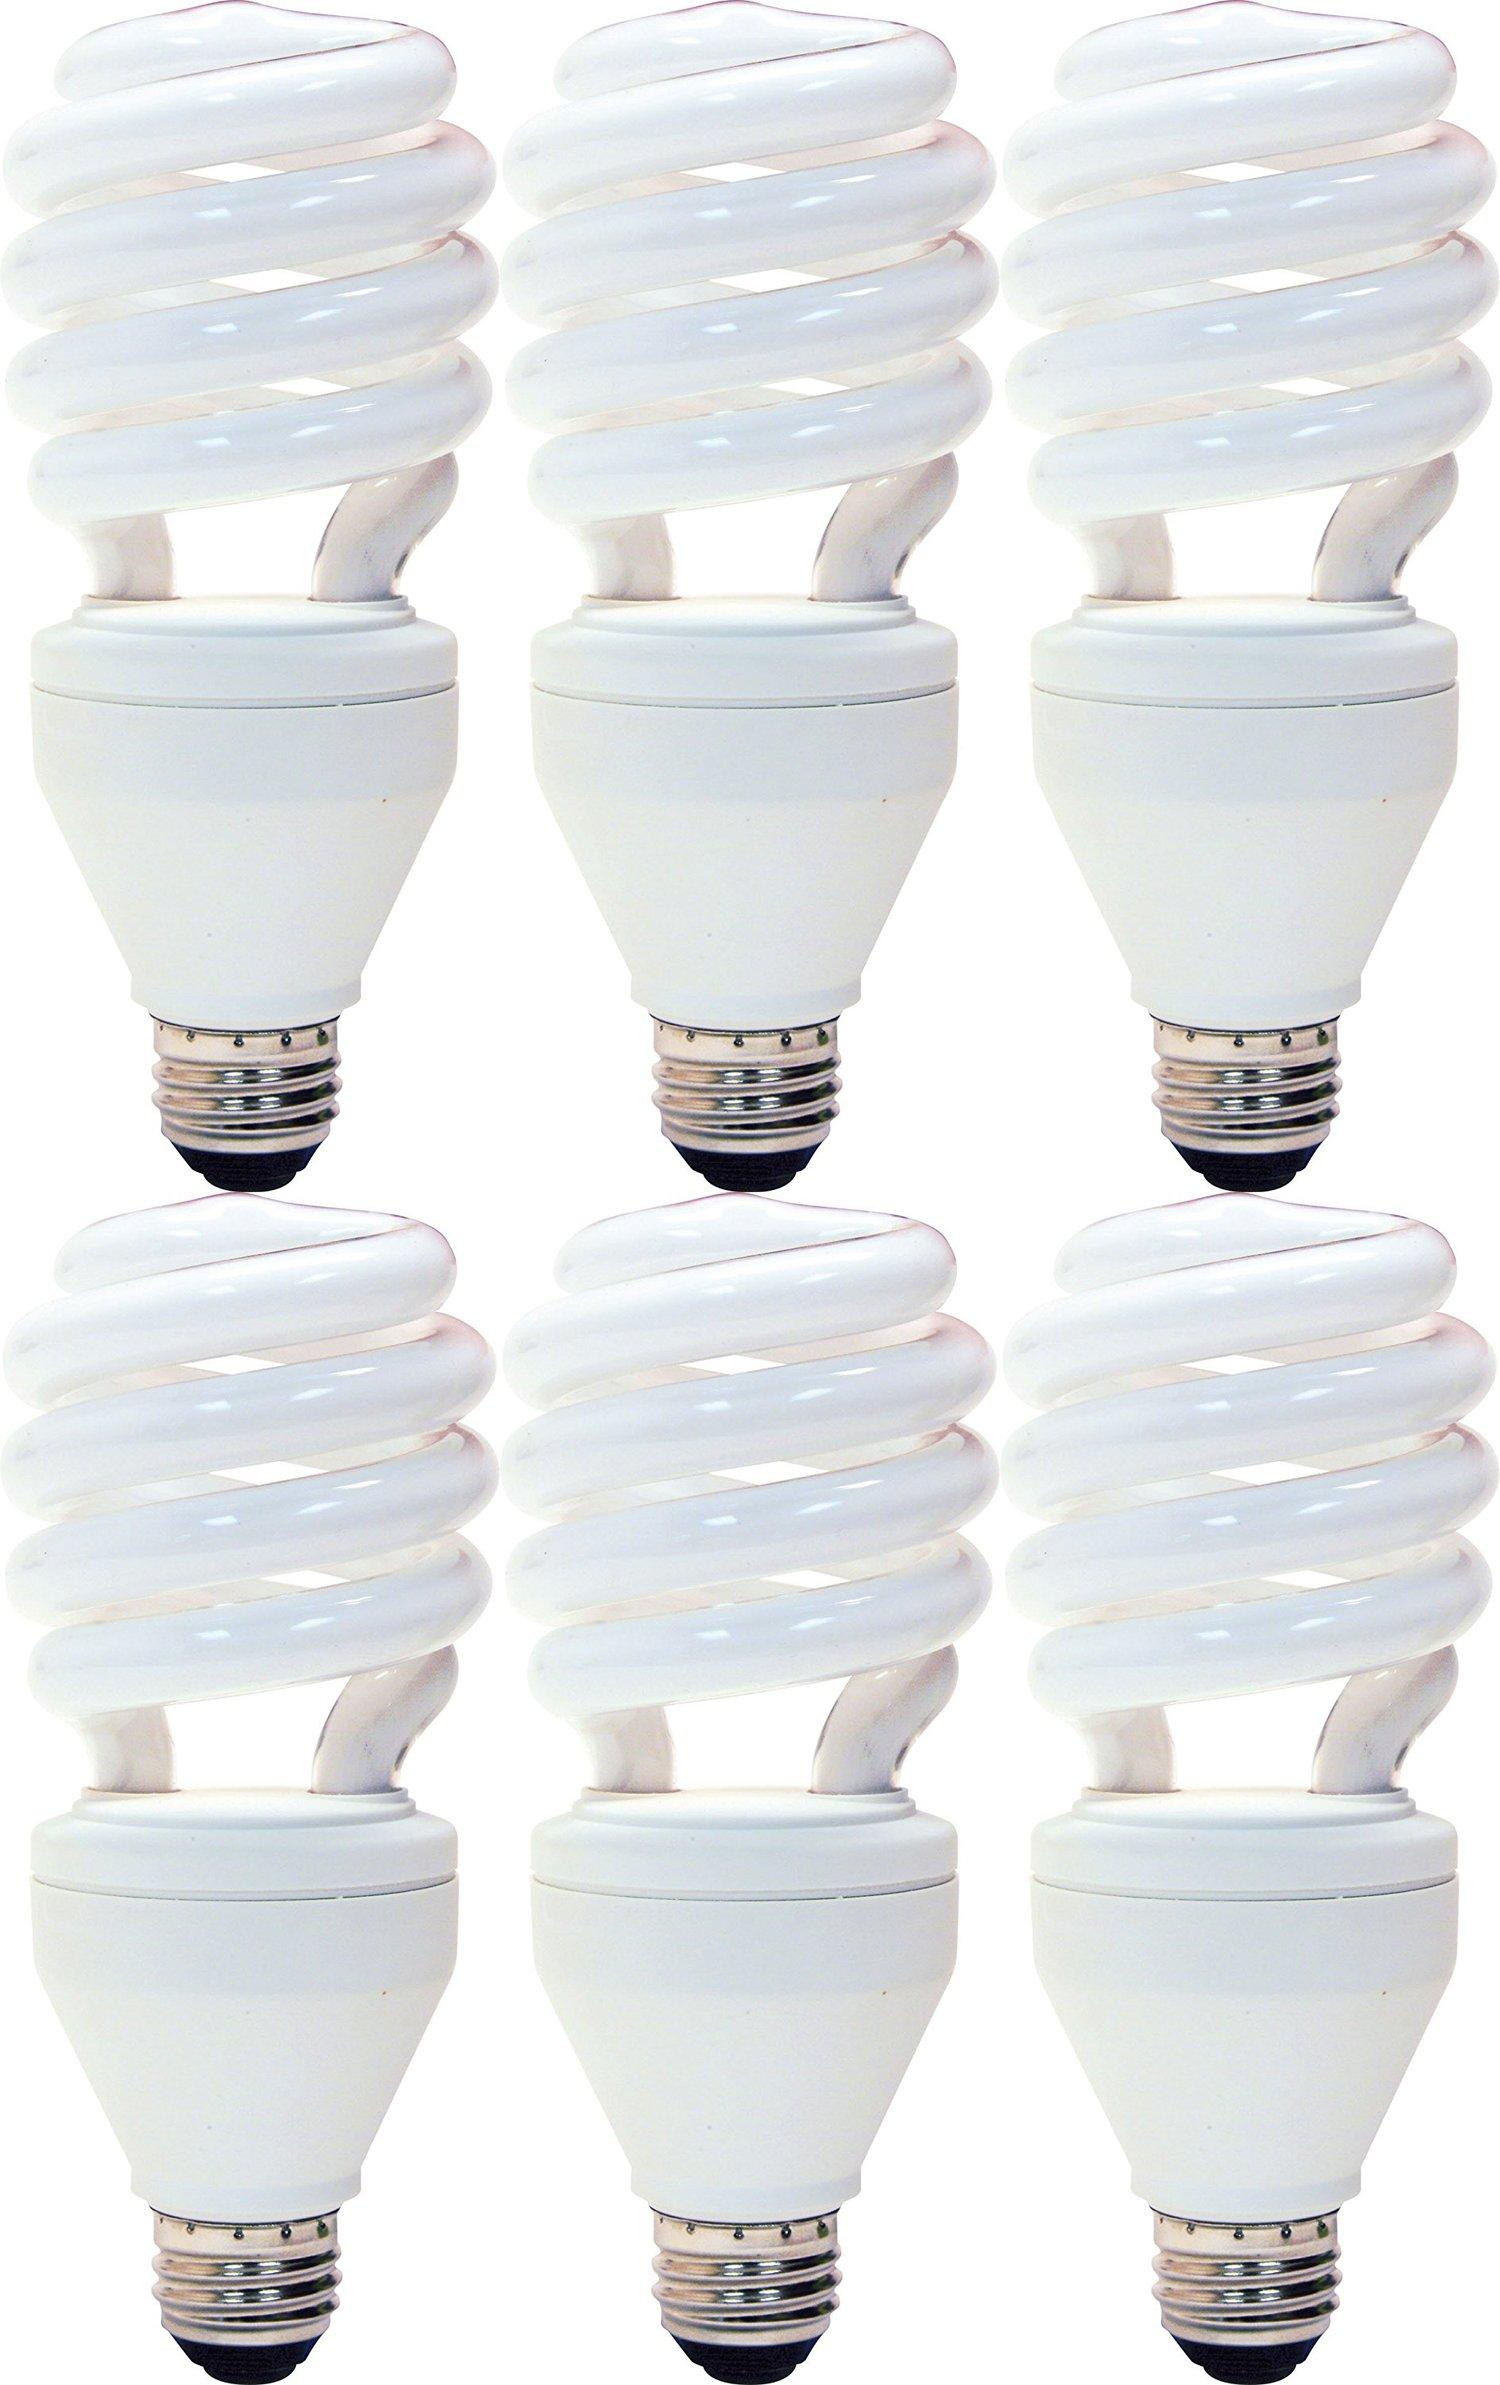 GE Energy Smart CFL 3-way 16/25/32-Watt; 600/1600/2150-Lumen, T3 Spiral Medium Base, 6-Pack